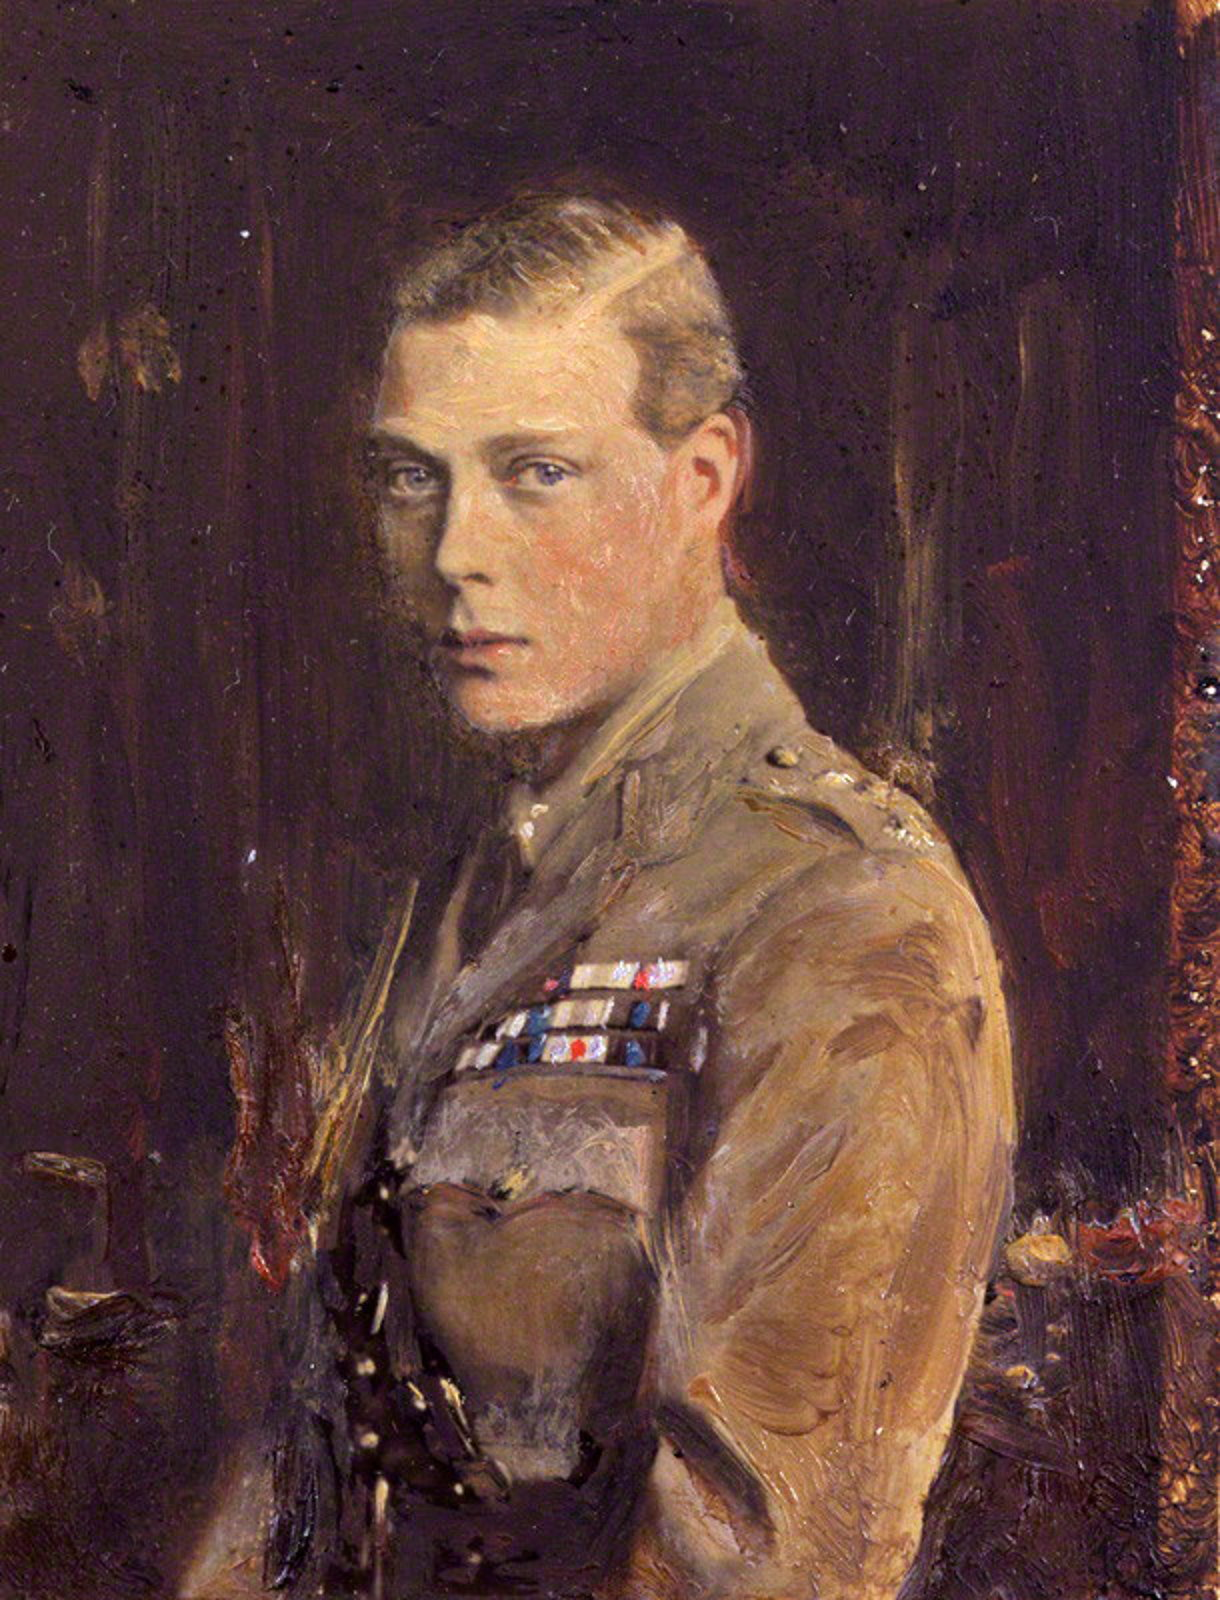 Portrait of Edward by Reginald Grenville Eves, circa 1920.